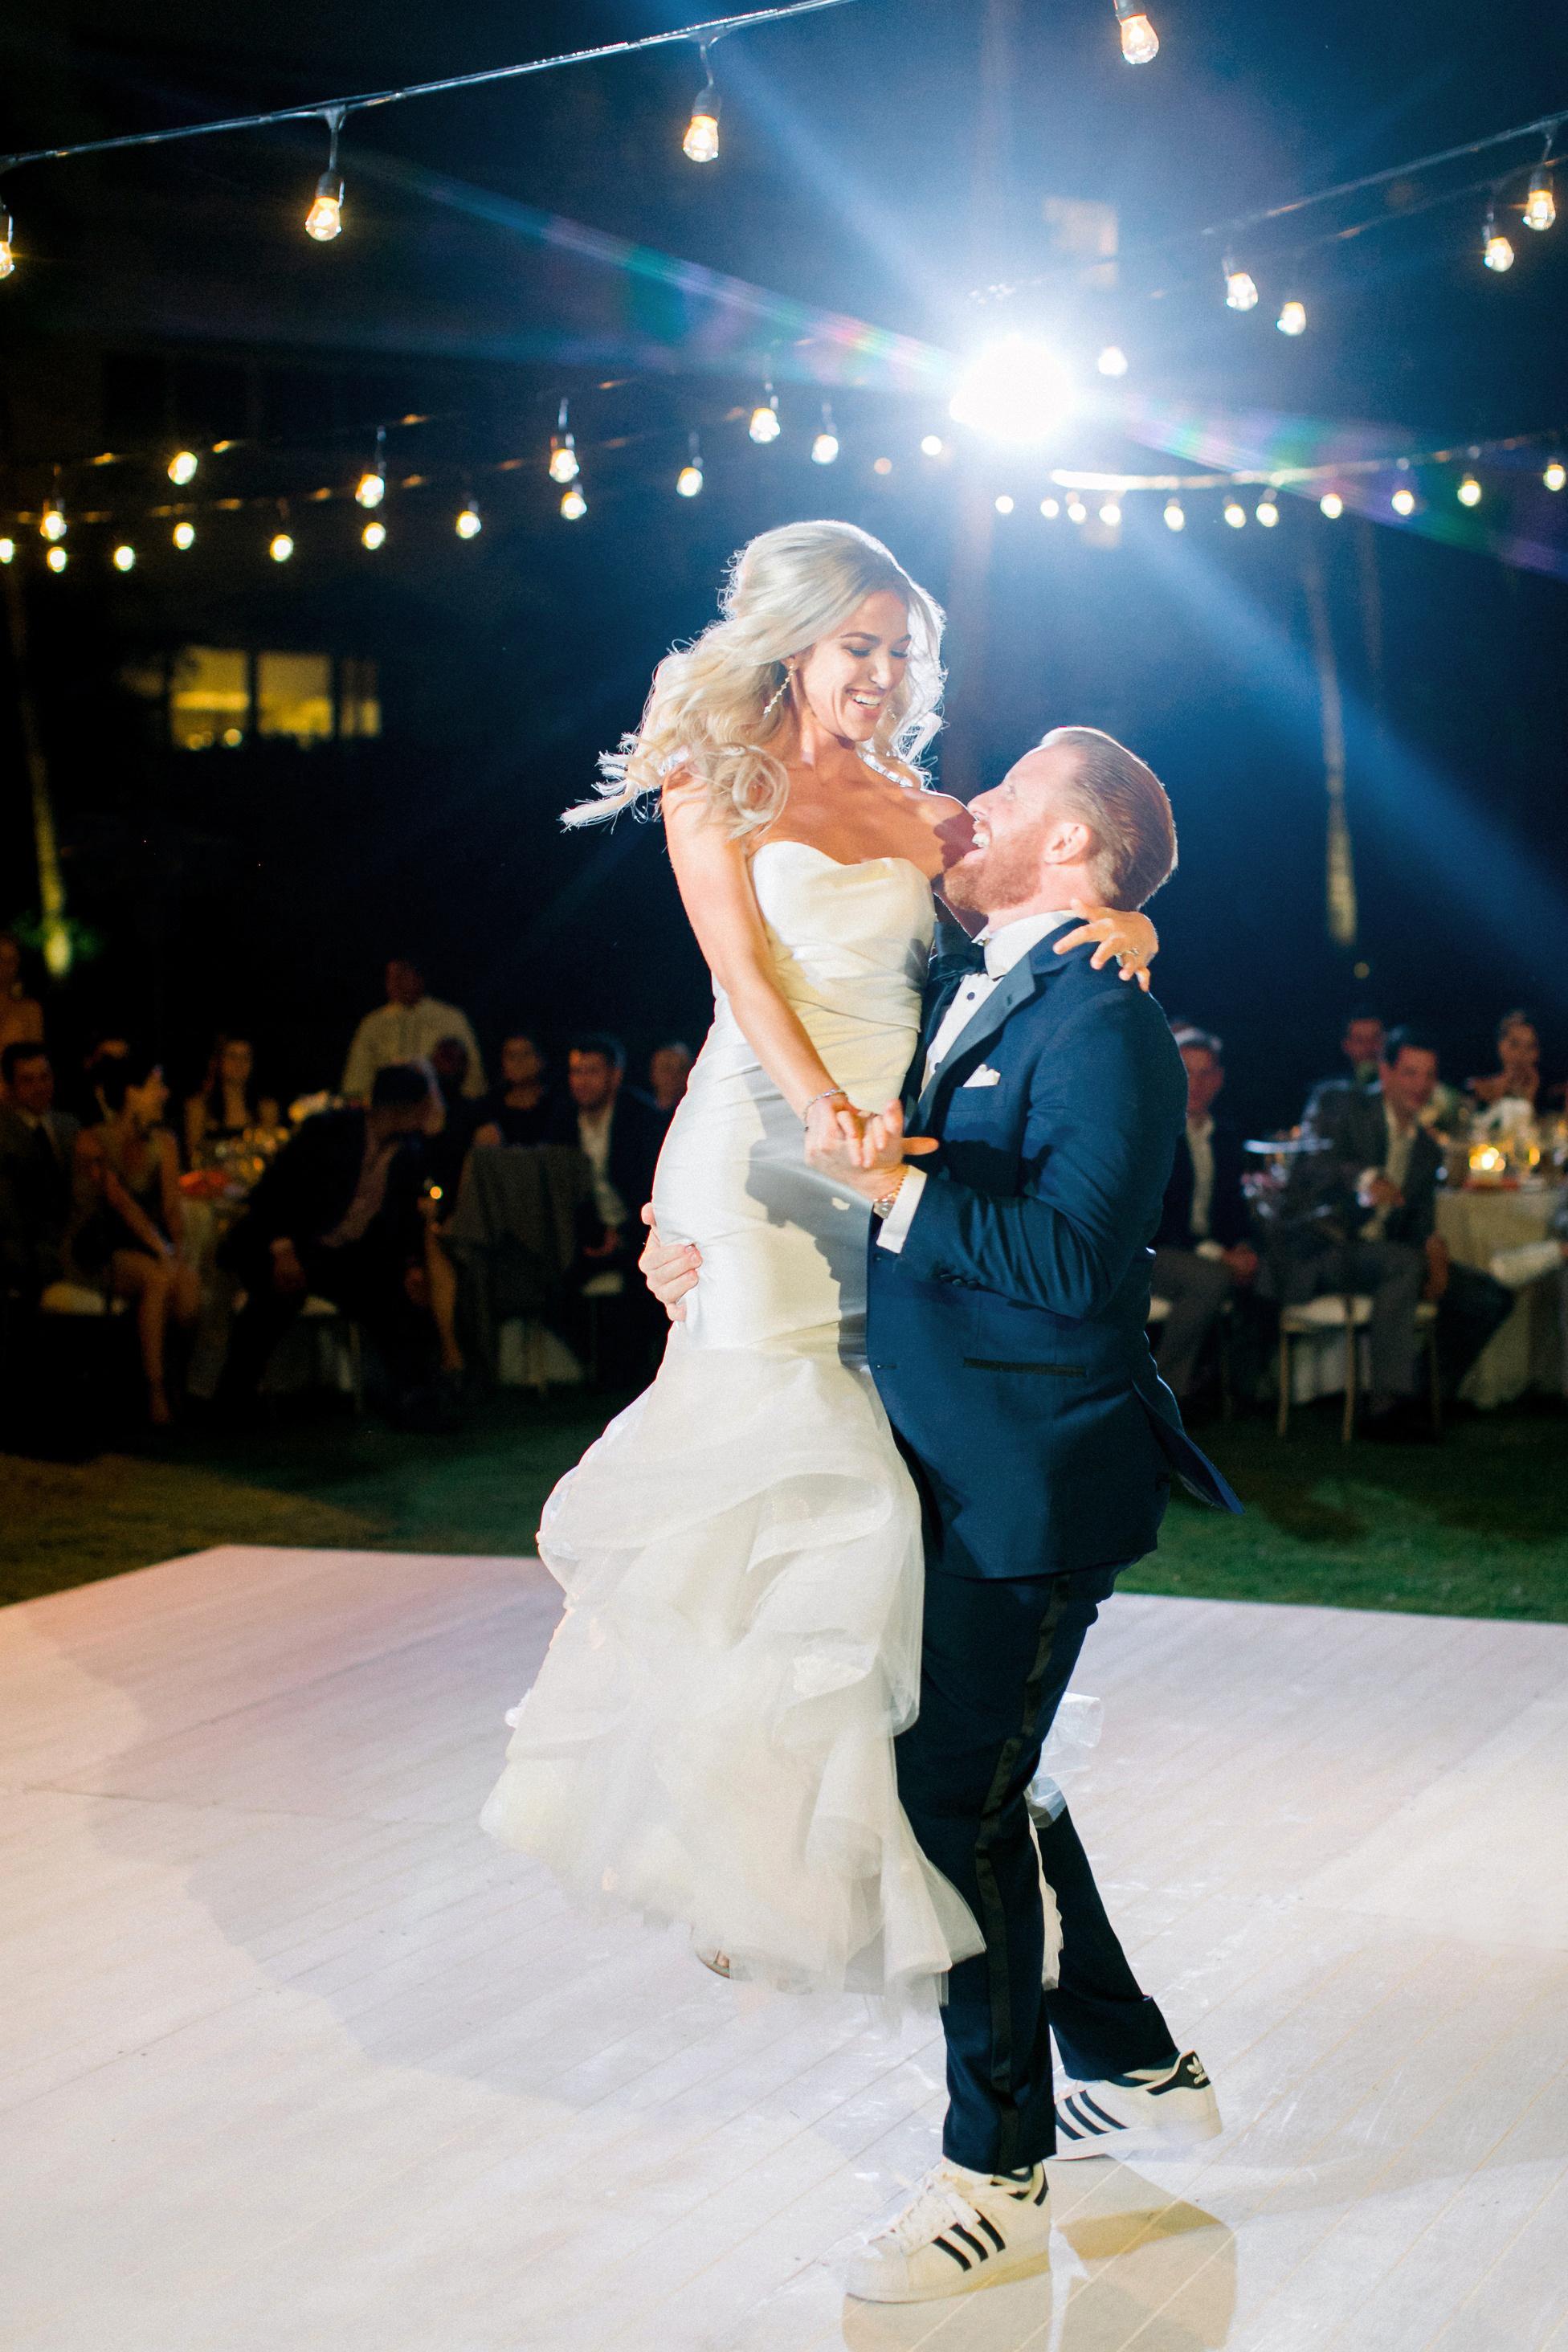 kourtney justin wedding mexico first dance couple